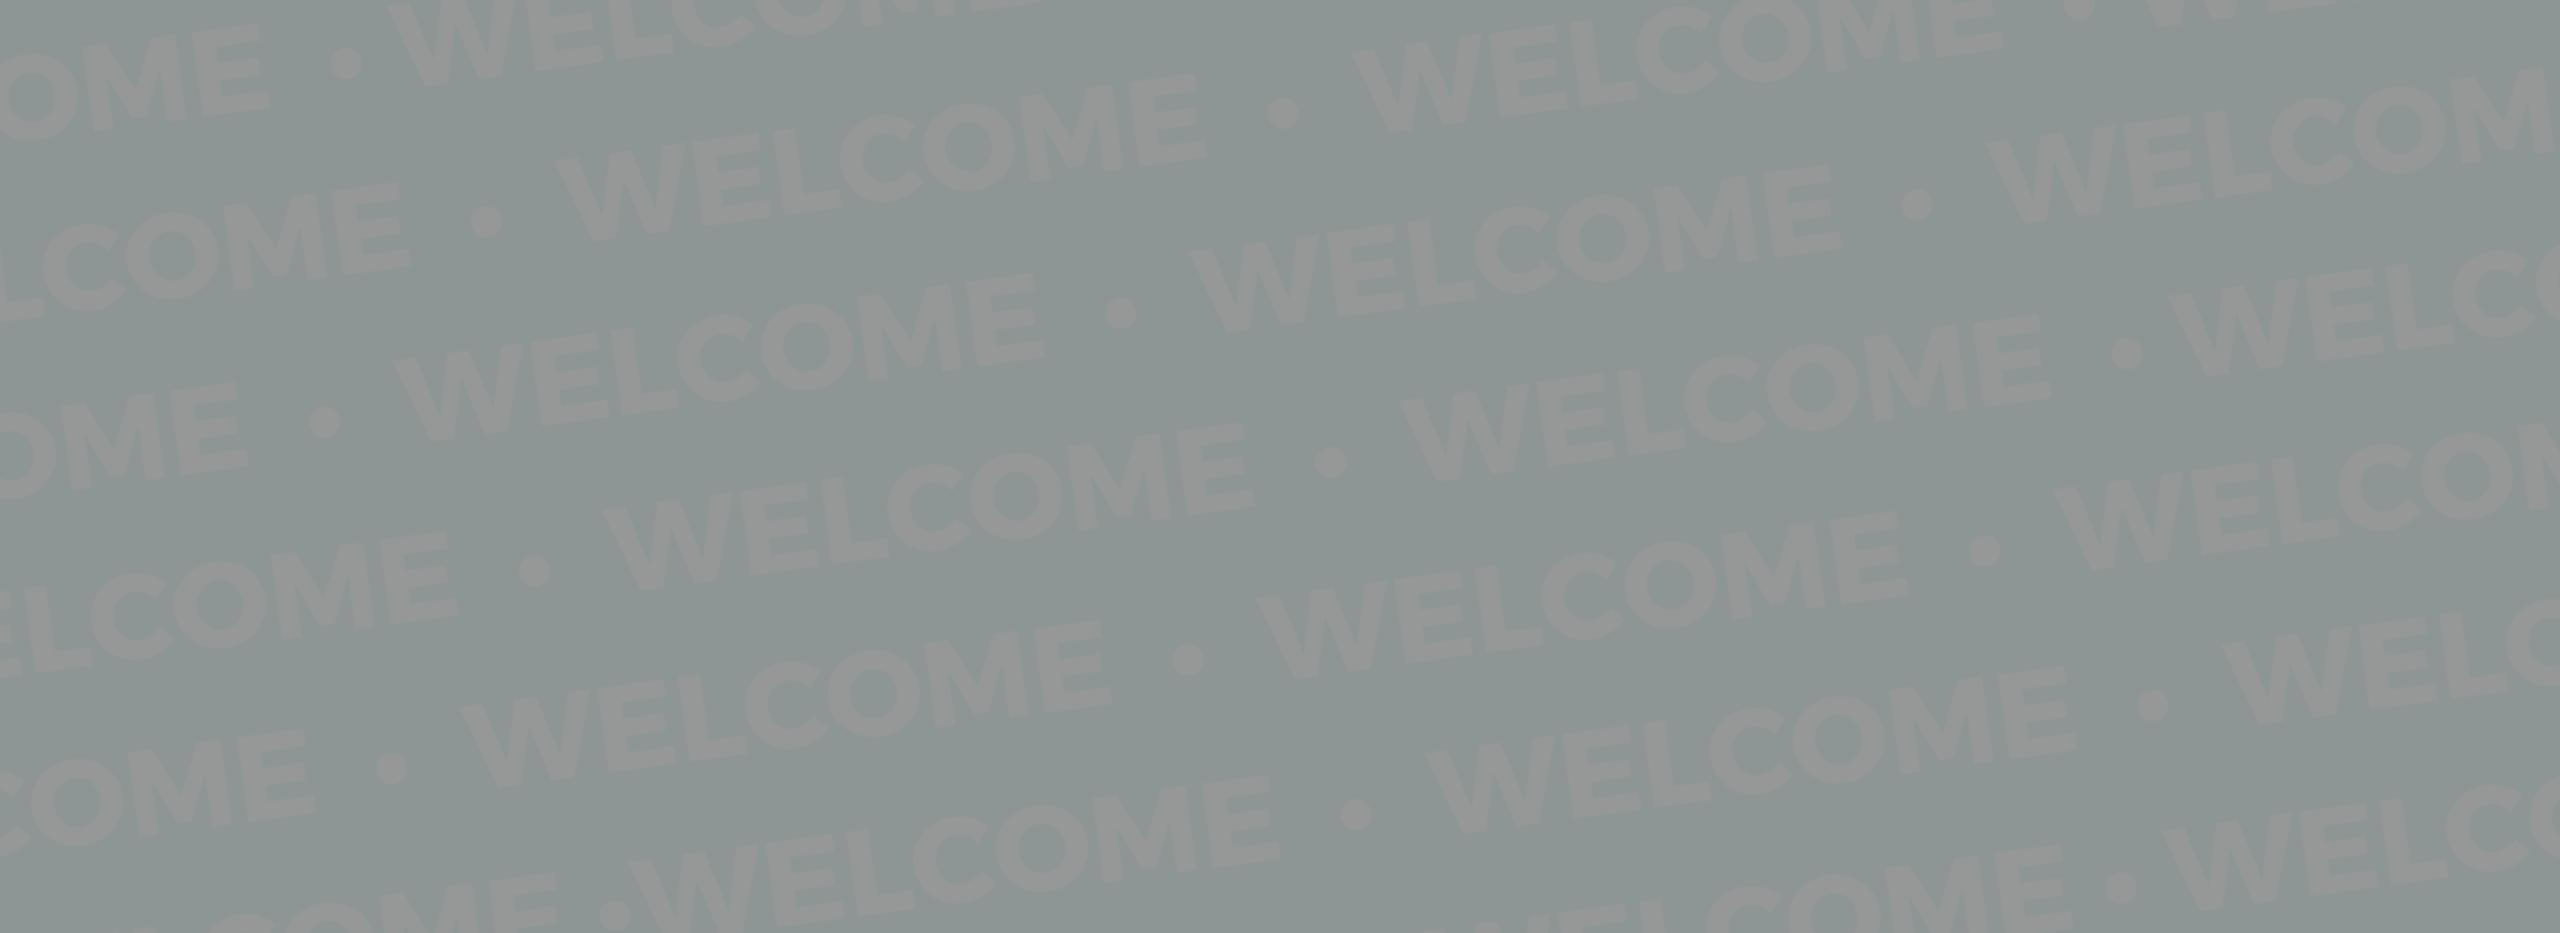 MRE | AP Welcomes New Agent Courtney Jordan